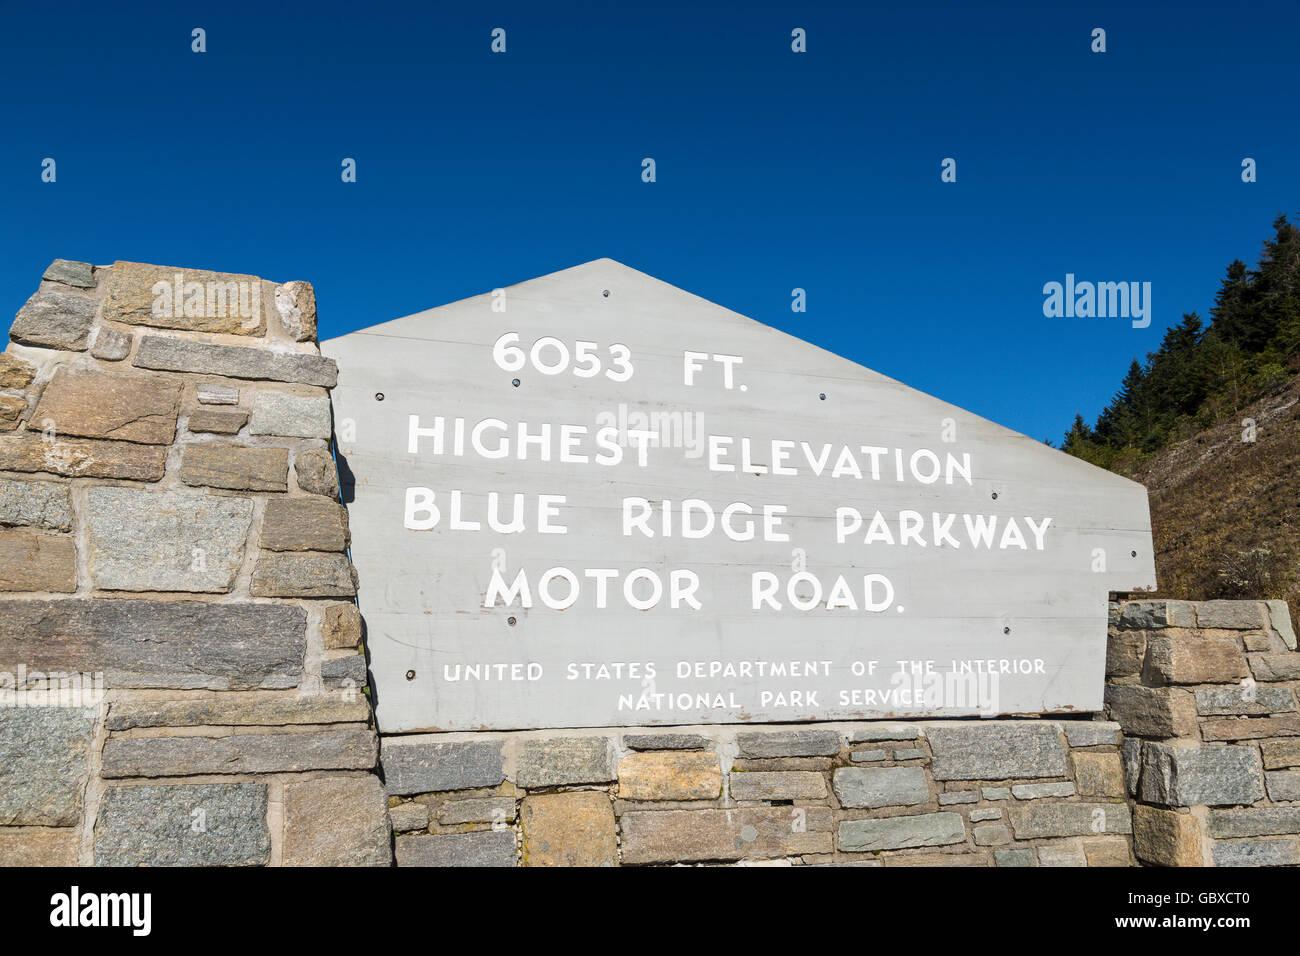 Highest elevation sign post on Blue Ridge Parkway road, Asheville, NC, USA - Stock Image